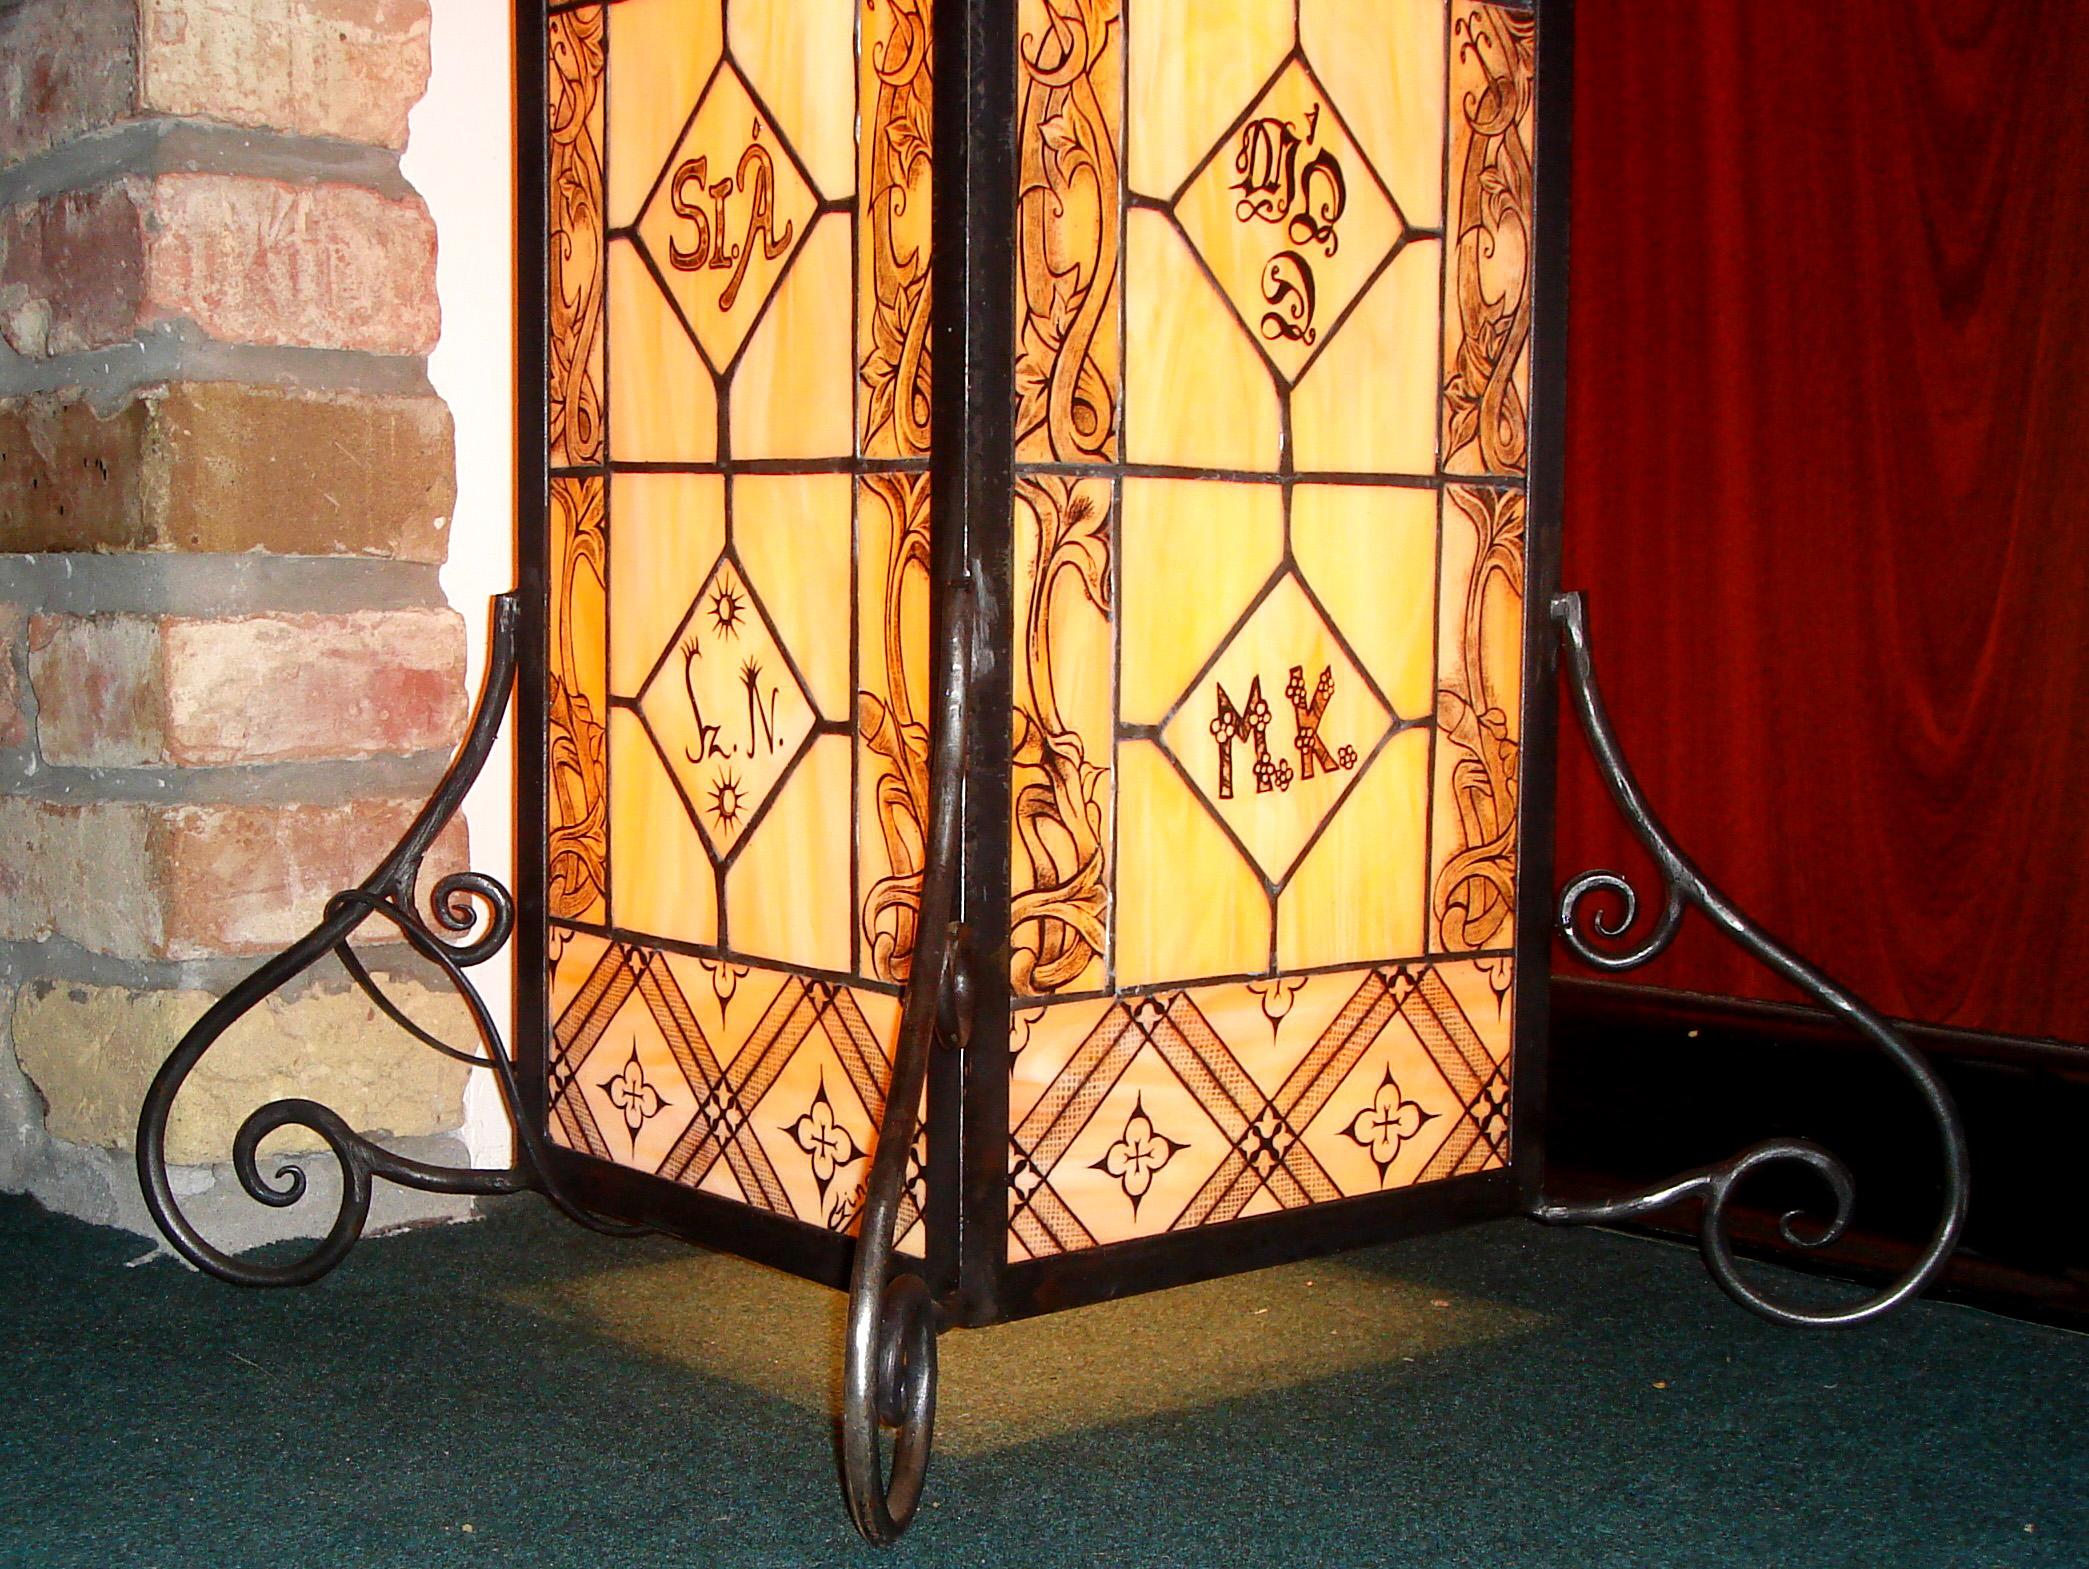 Szogletes-kezzel-festett-tiffany-lampa-kovacsoltvas-tartoval-2